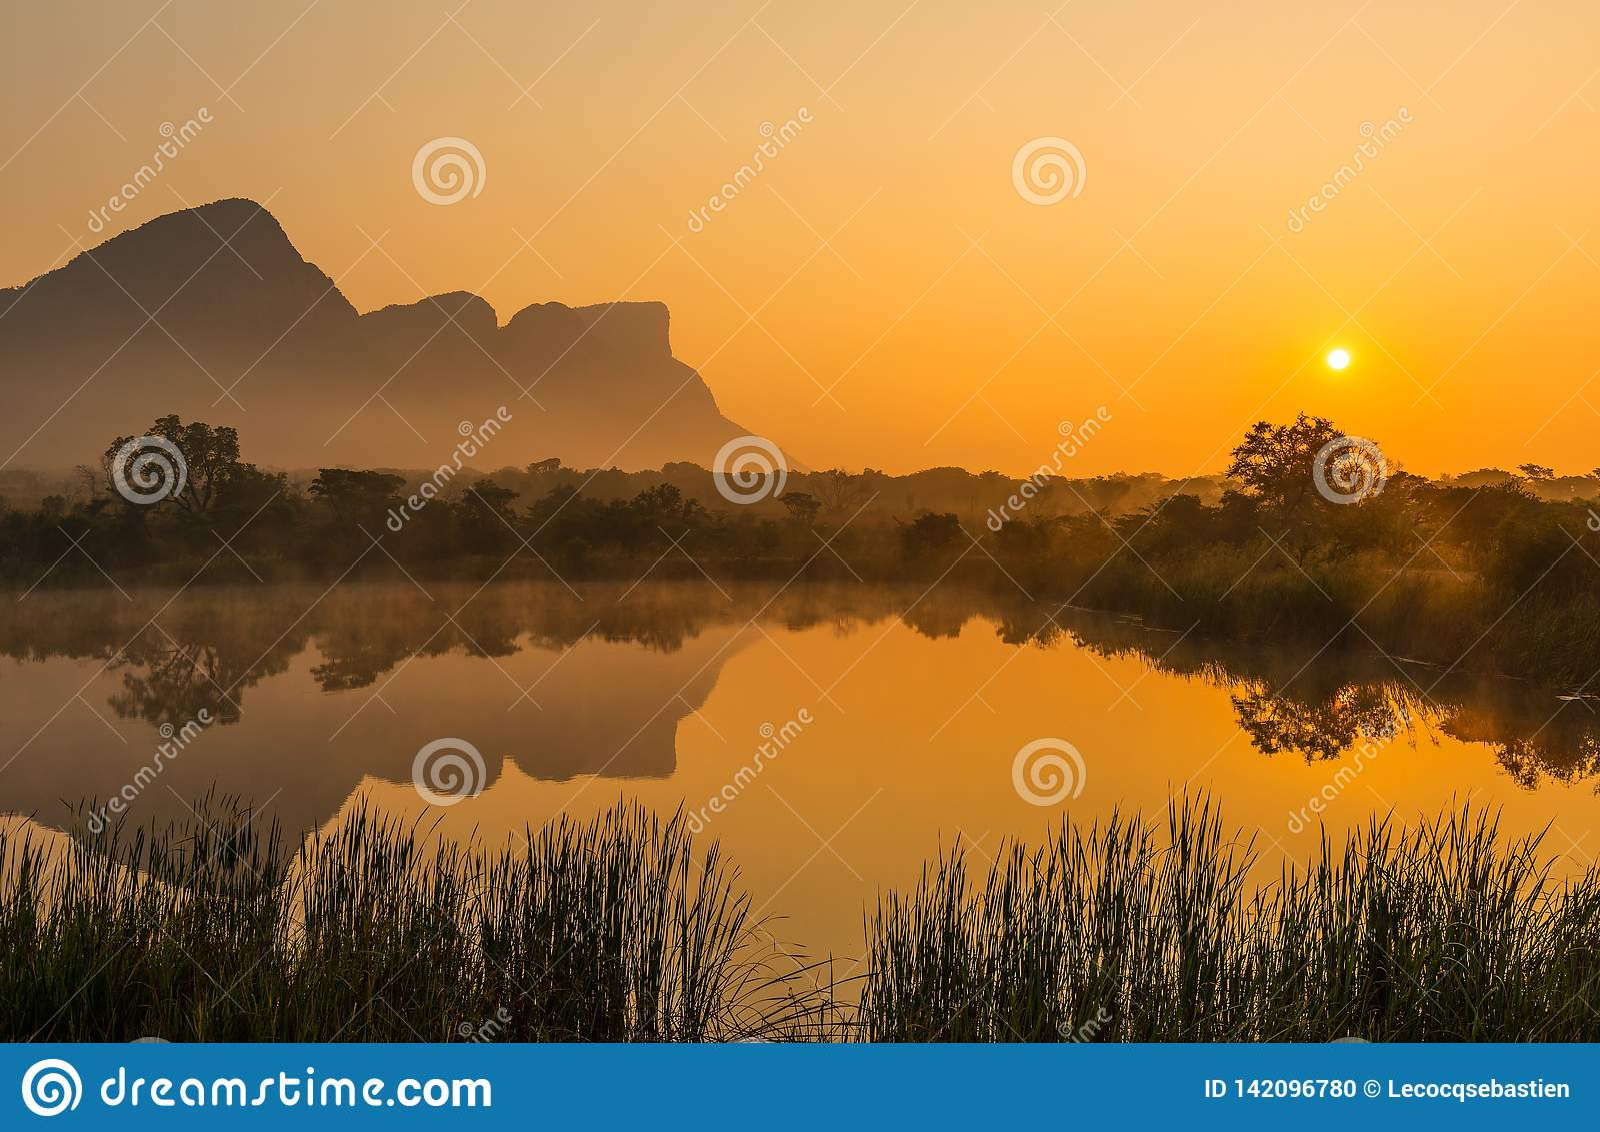 Sunrise in the Entabeni Safari Game Reserve, South Africa